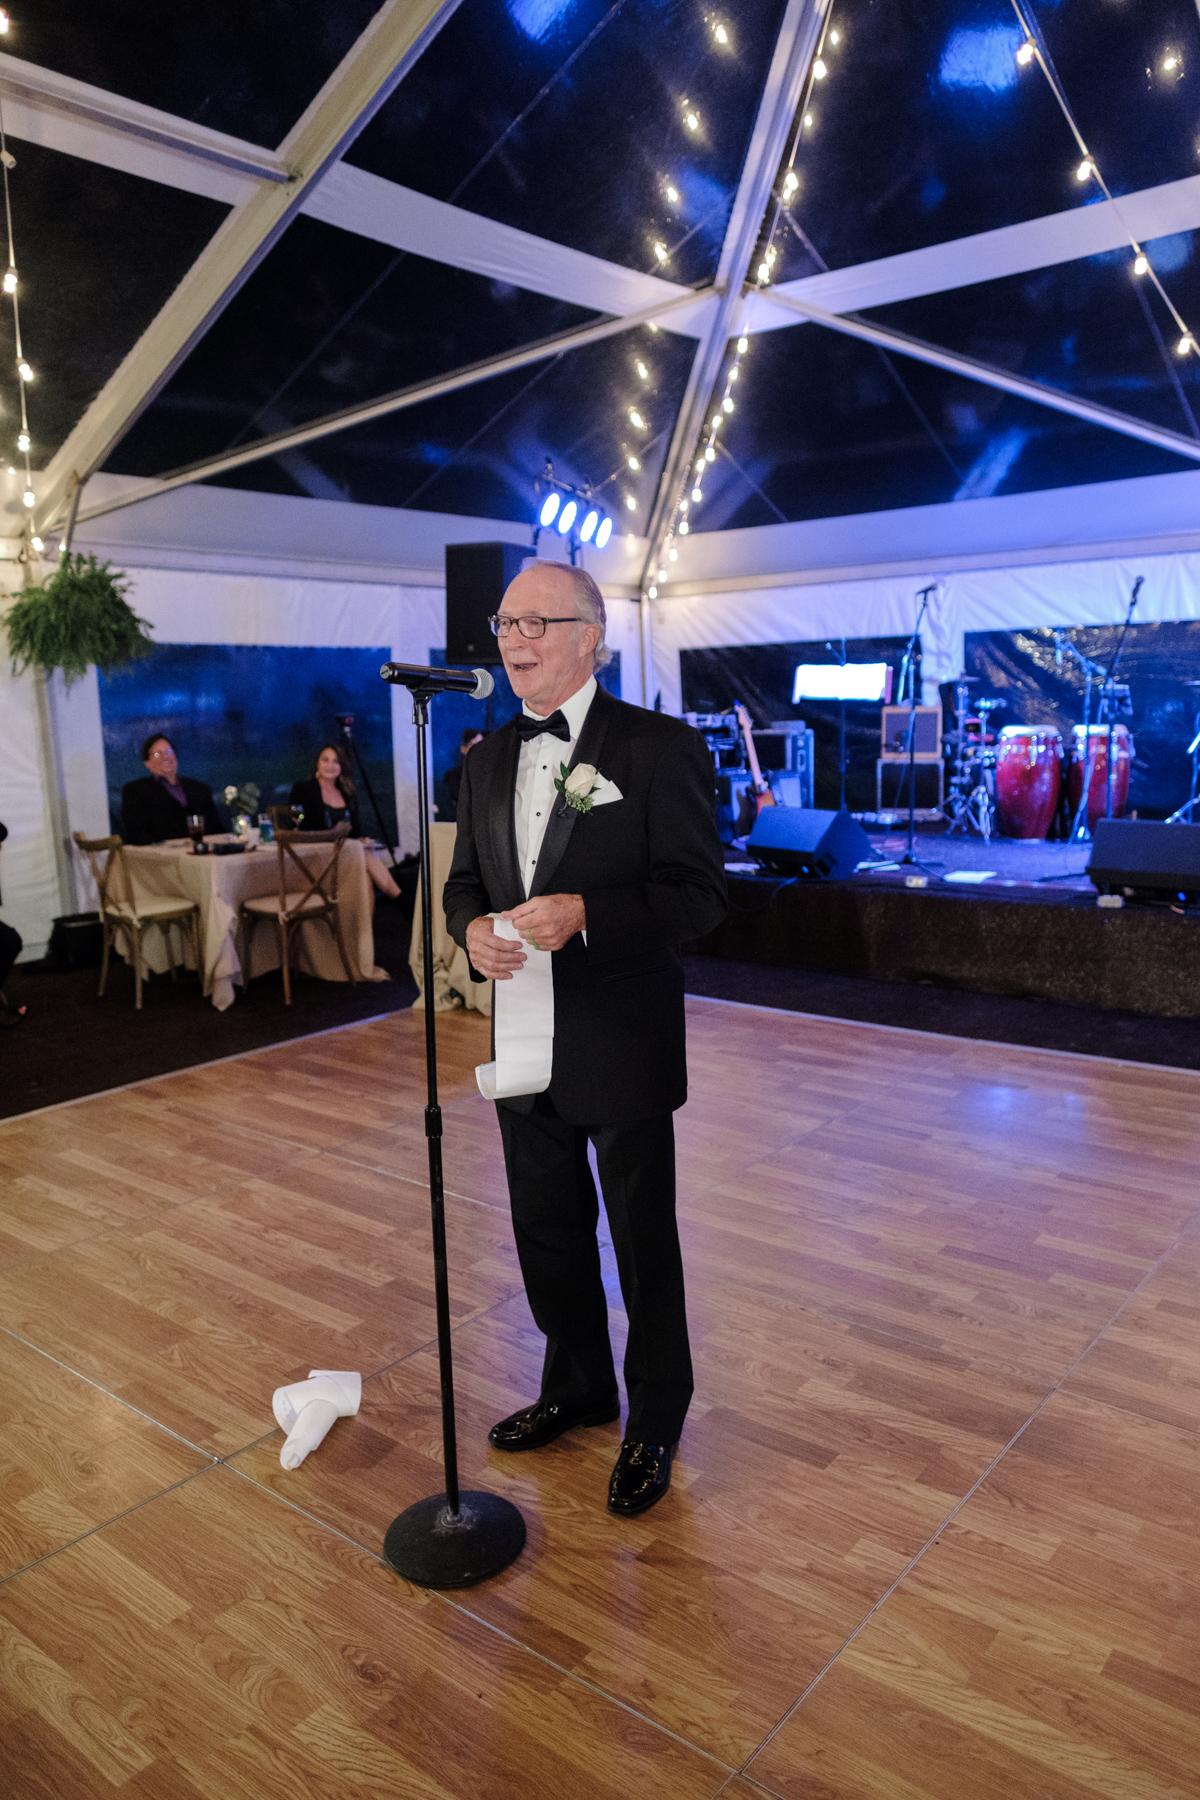 2017_BAP_KalliMatt_Gleneagles_CountryClub_Lemont_Wedding-81.jpg